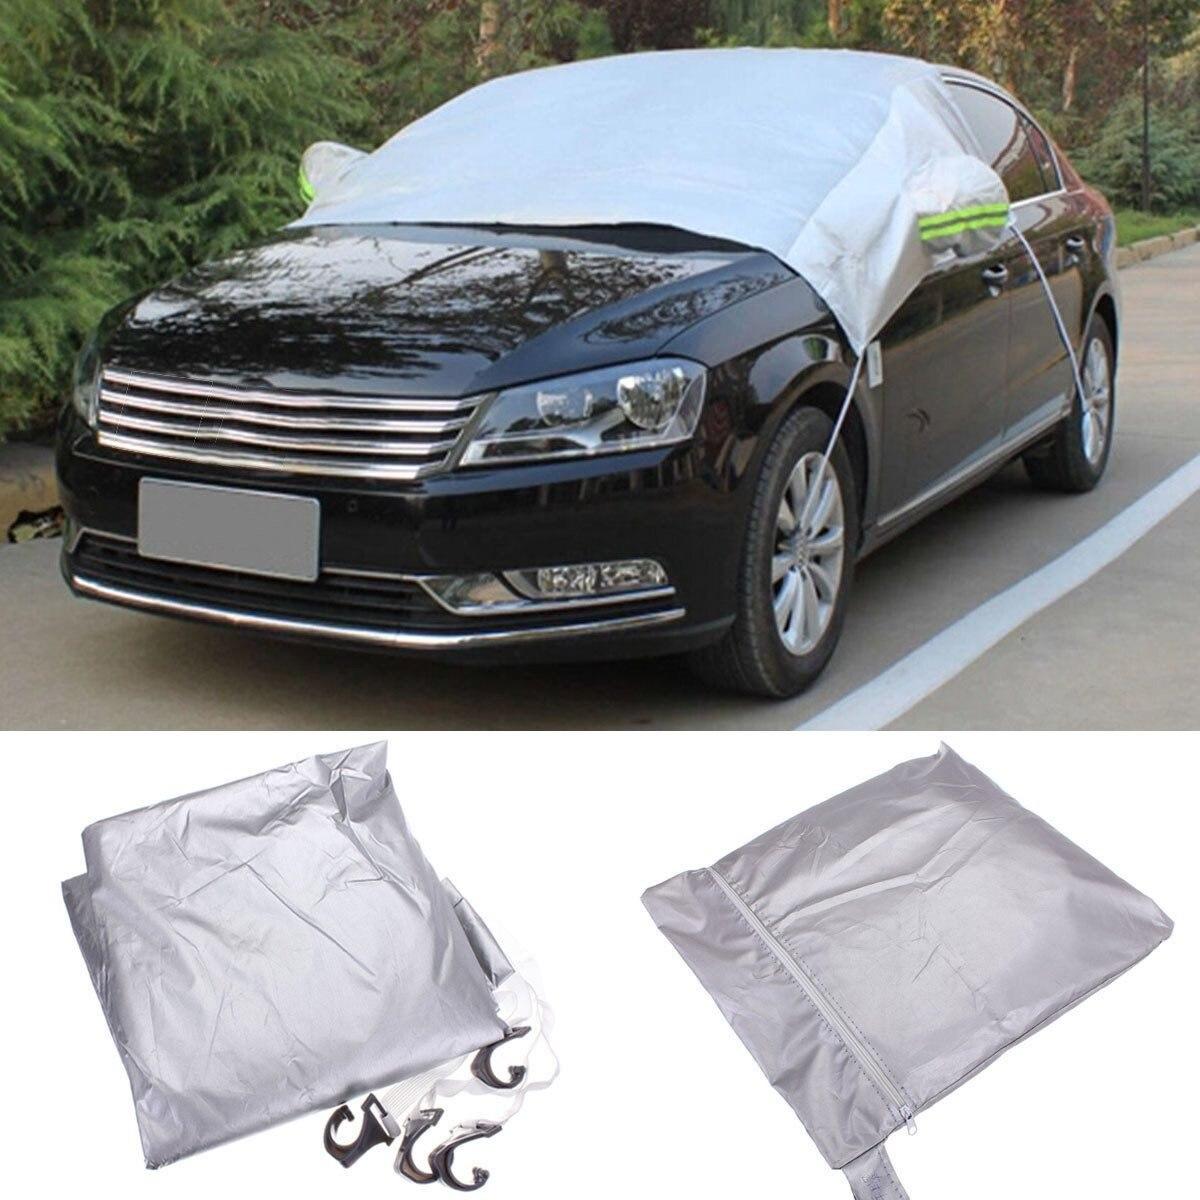 Universal 238x169cm Car Windscreen Cover Heat Sun Shade Anti Snow Frost Ice Shield Dust Protector